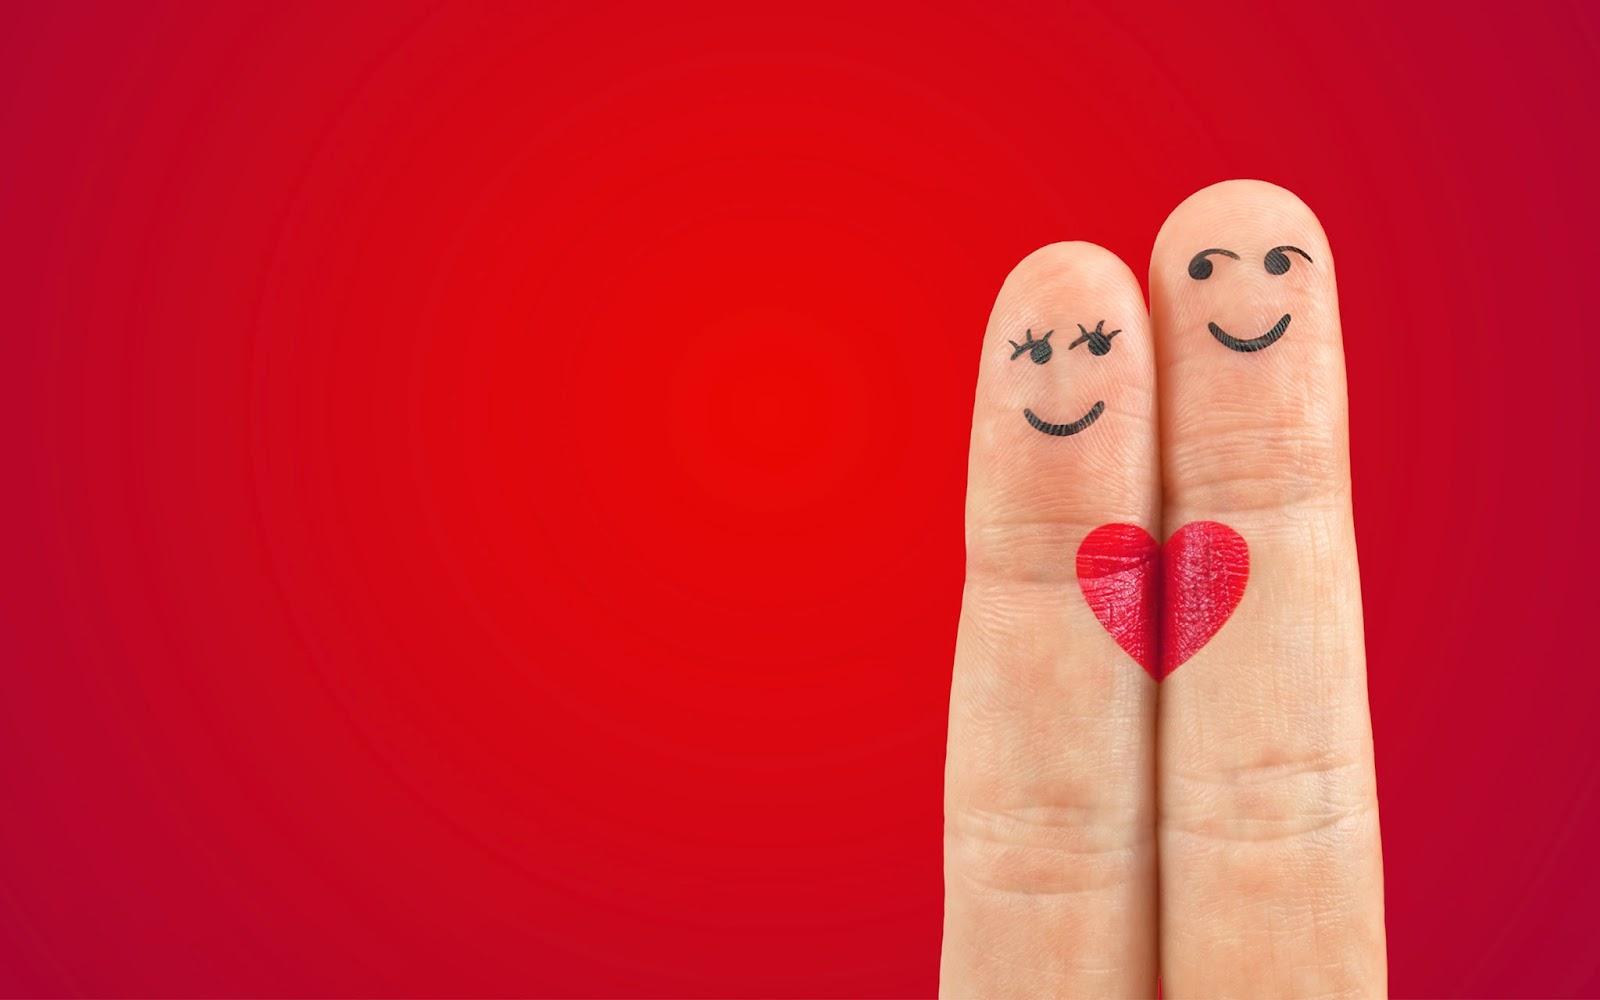 Love Pair Heart Fingers